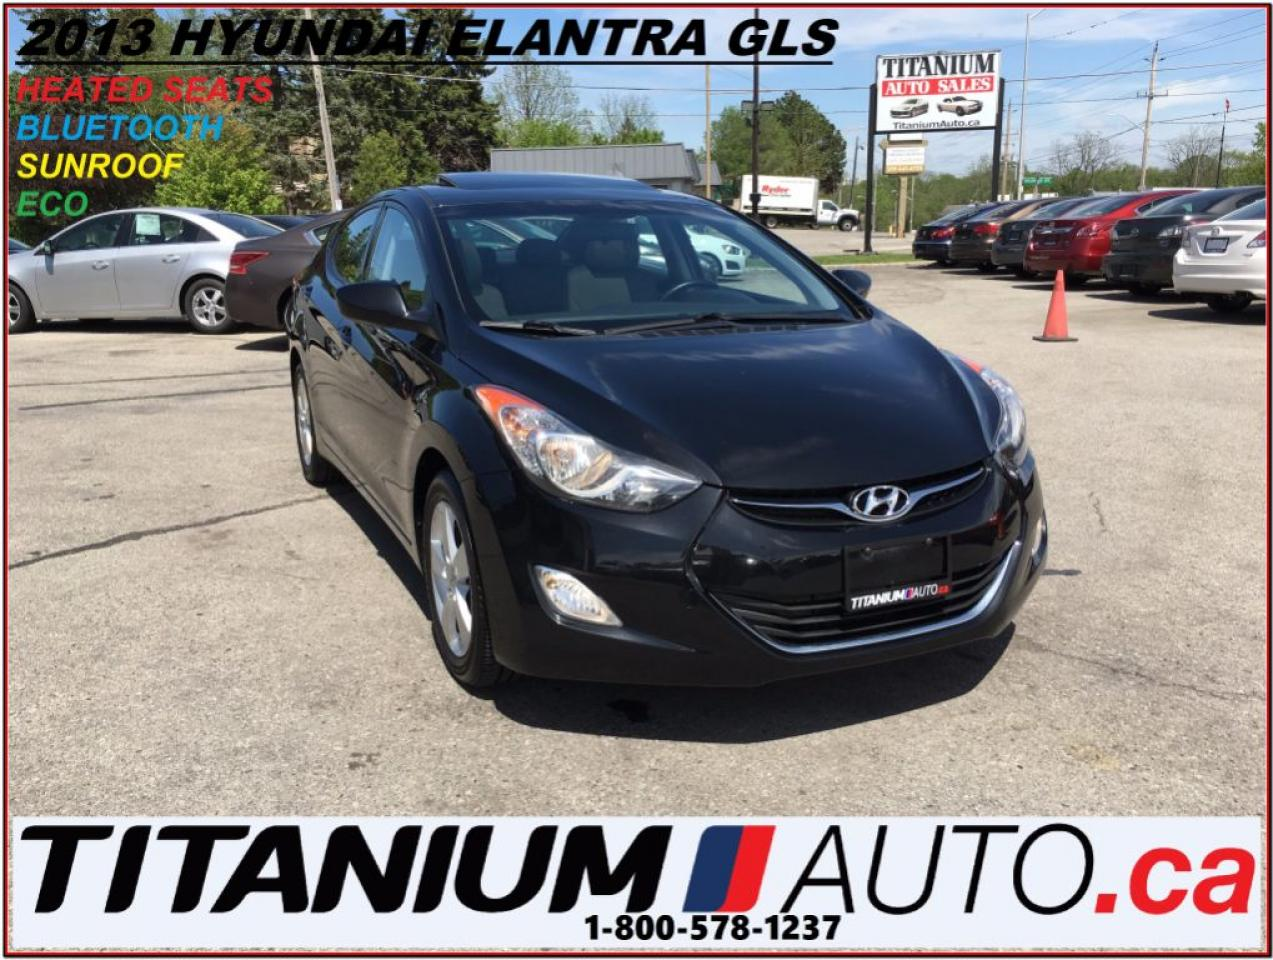 2013 Hyundai Elantra GLS+BlueTooth+Sunroof+Alloys+Heated Seats+New Tire